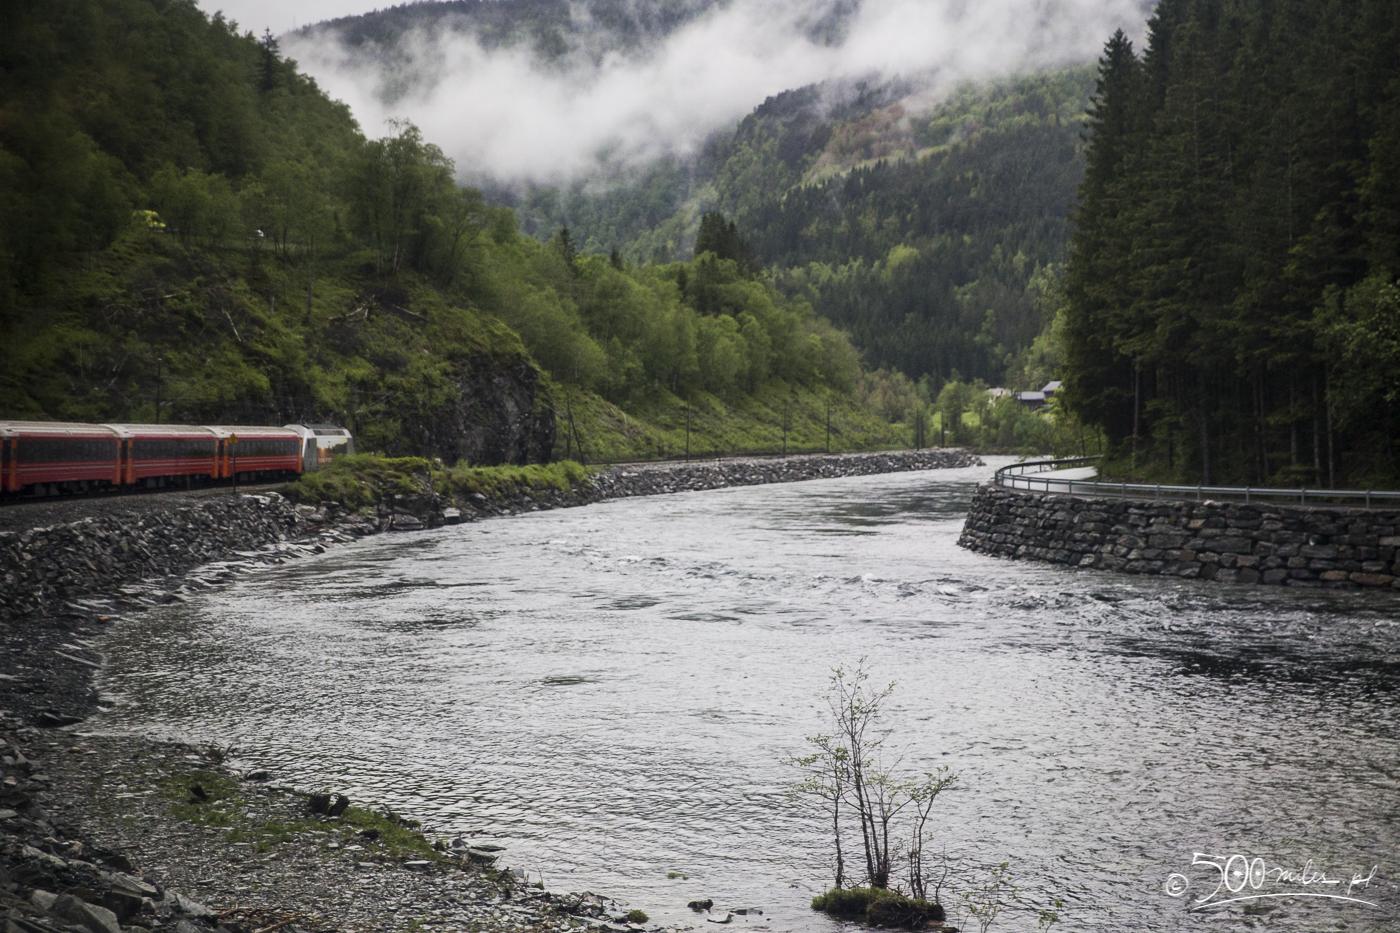 Oslo-Bergen train ride - getting closer to Bergen